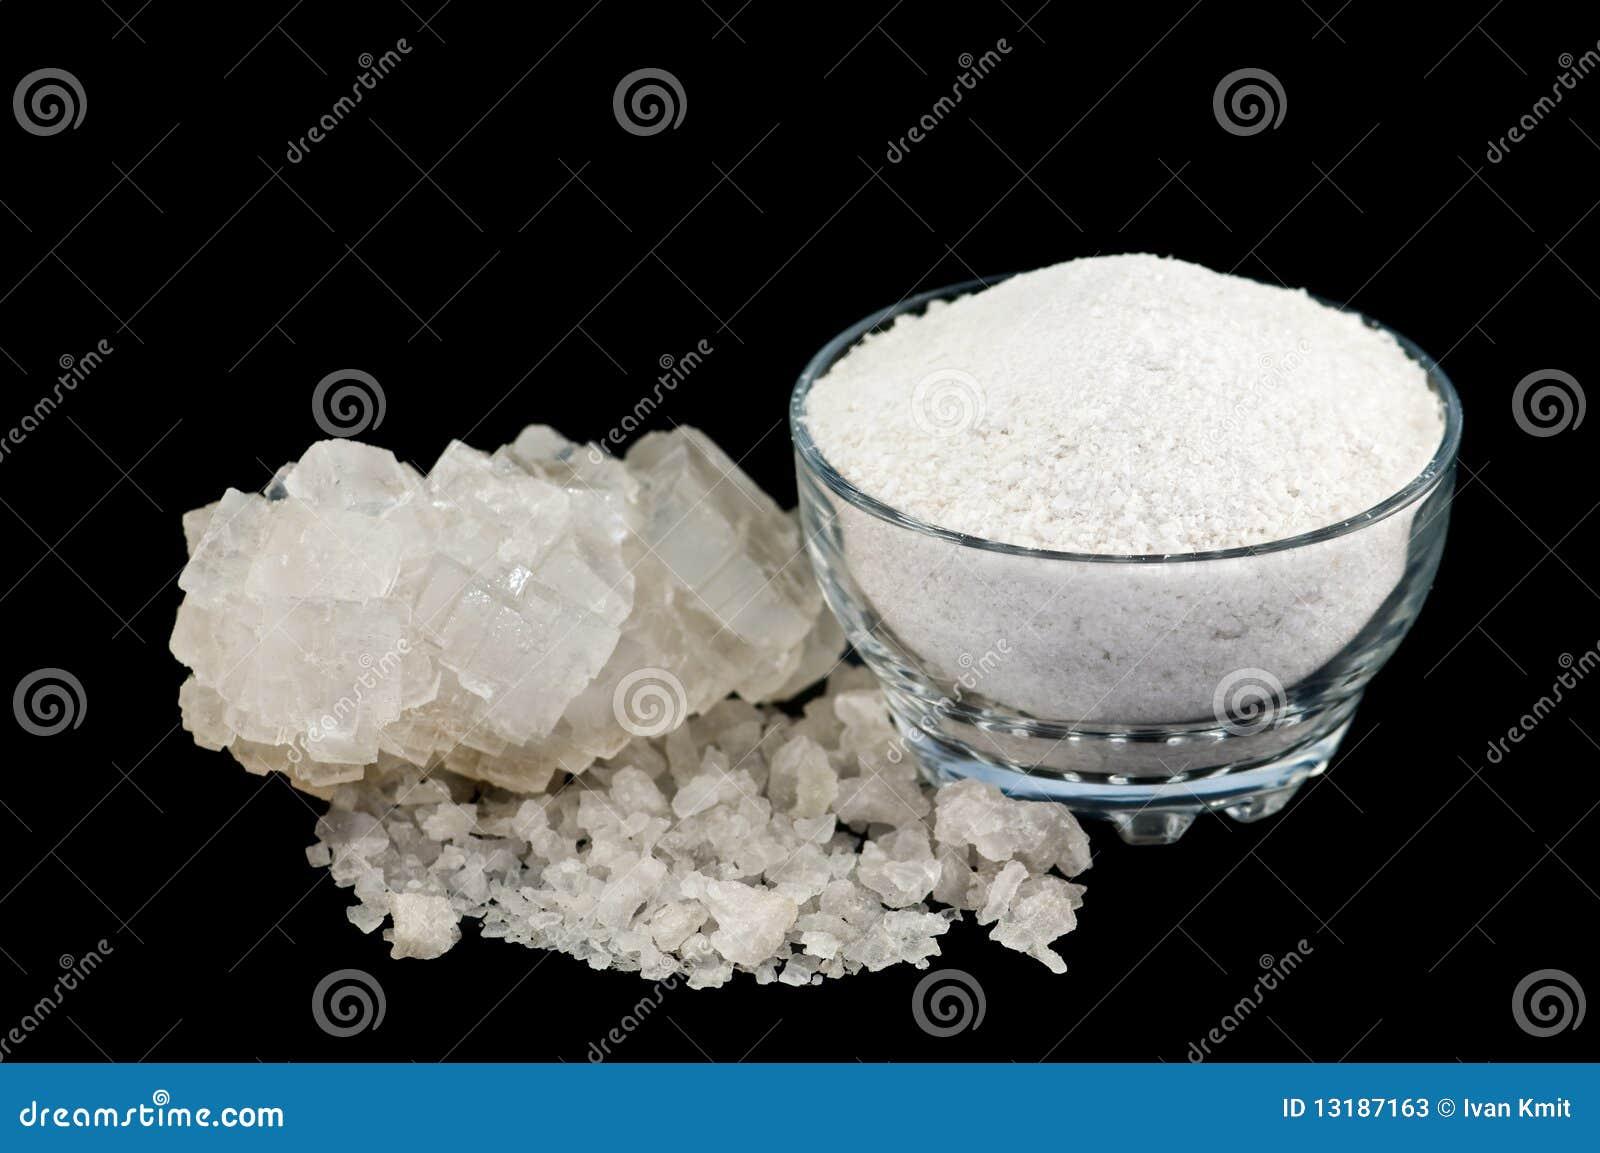 盐哺-m�f��dy.�9�b�/i_mr: no pr: no 2 634 3 盐 id 13187163 © ivan kmit | dreamst